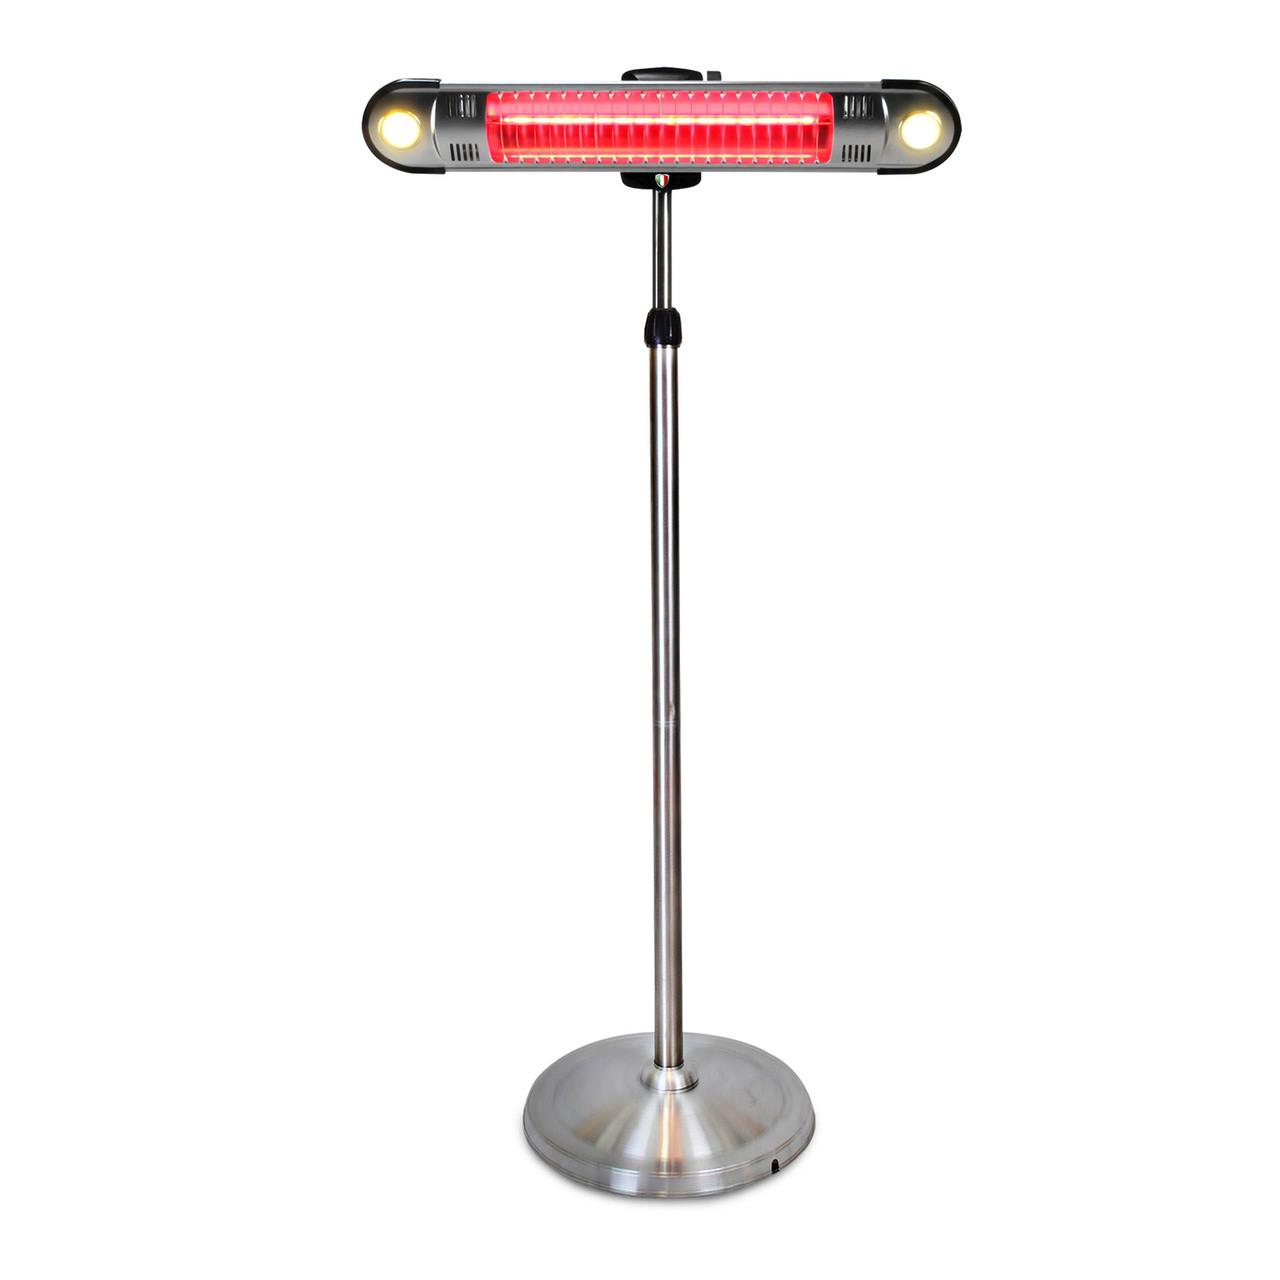 Lava Heat Electric KD WALL-E Pedestal Heater - Stainless Steel